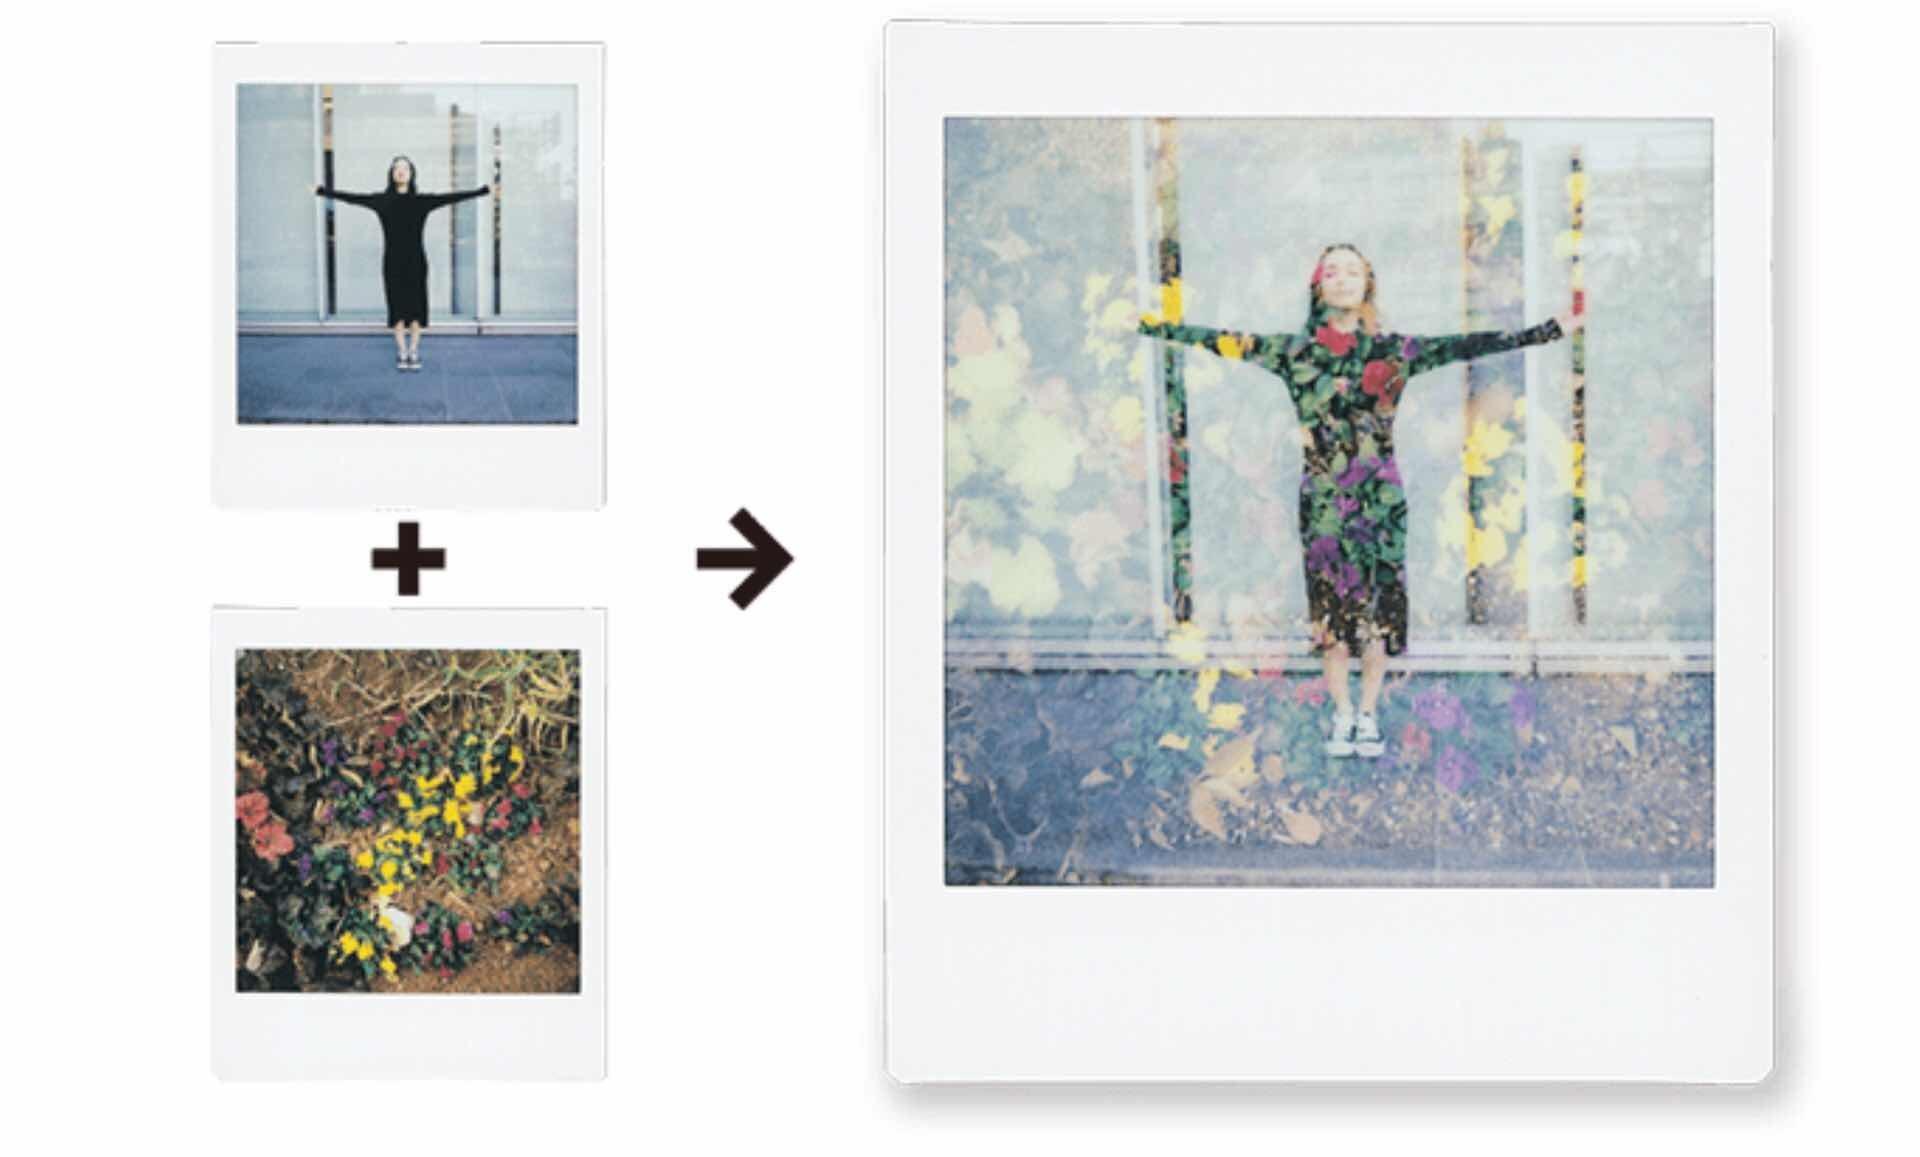 fujifilm-instax-square-sq6-instant-film-camera-2